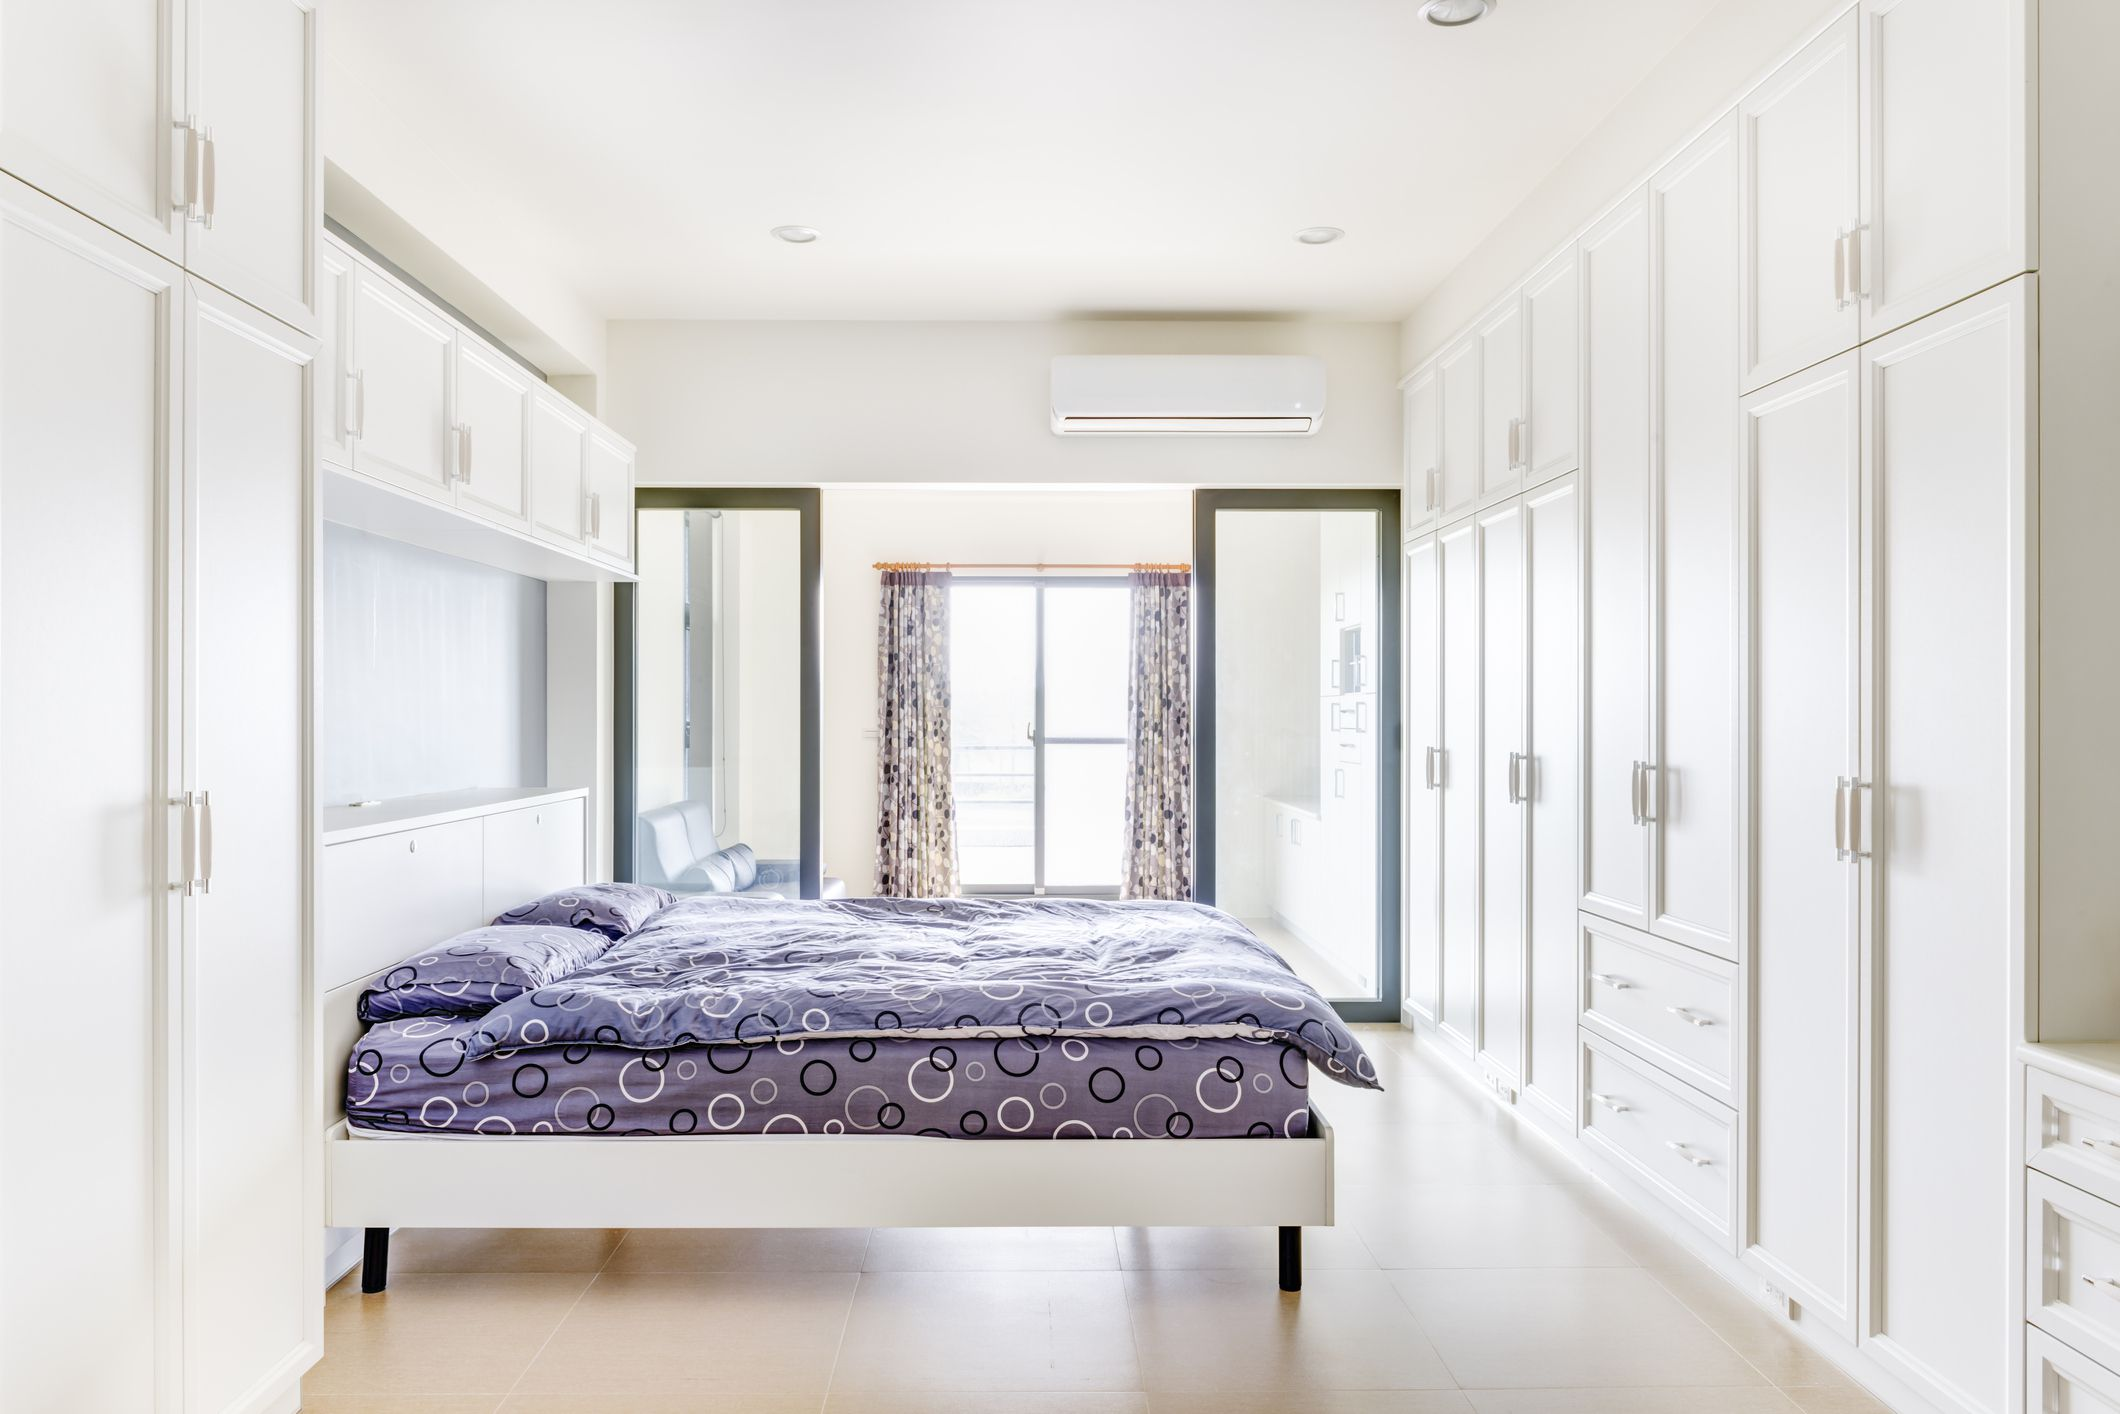 vinyl bedroom flooring - Flooring In Bedroom